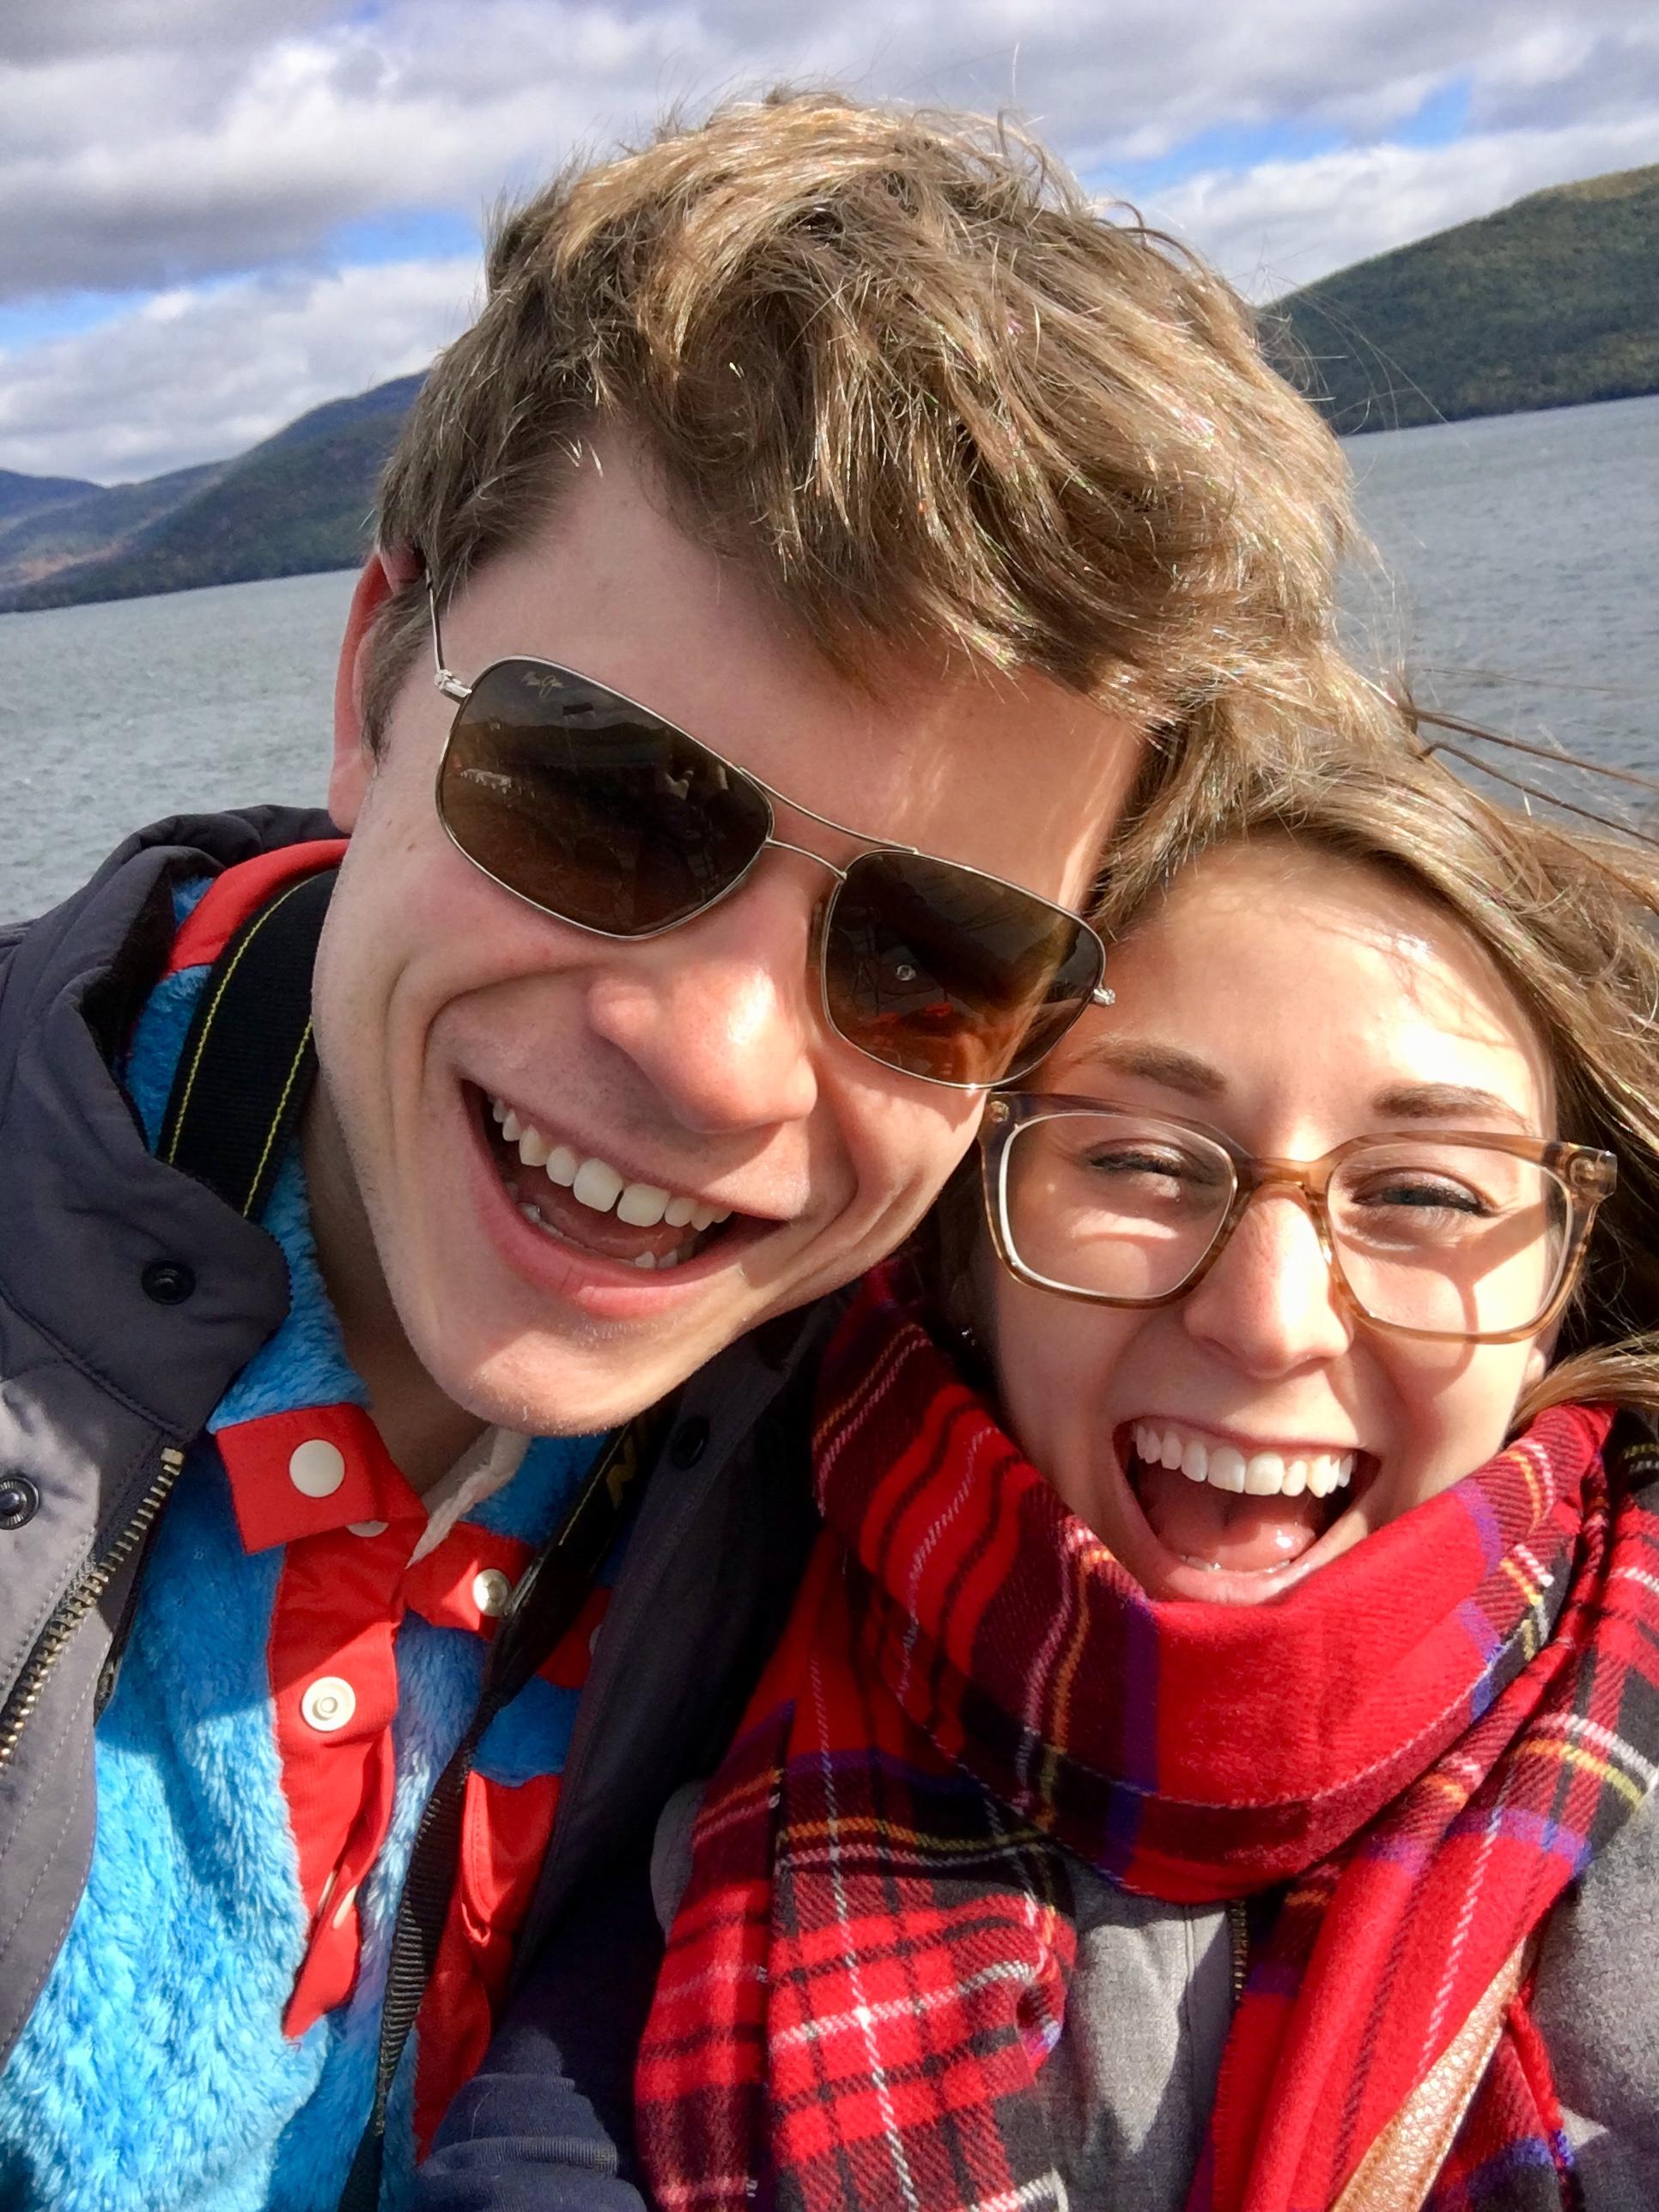 selfie photo of couple on lake